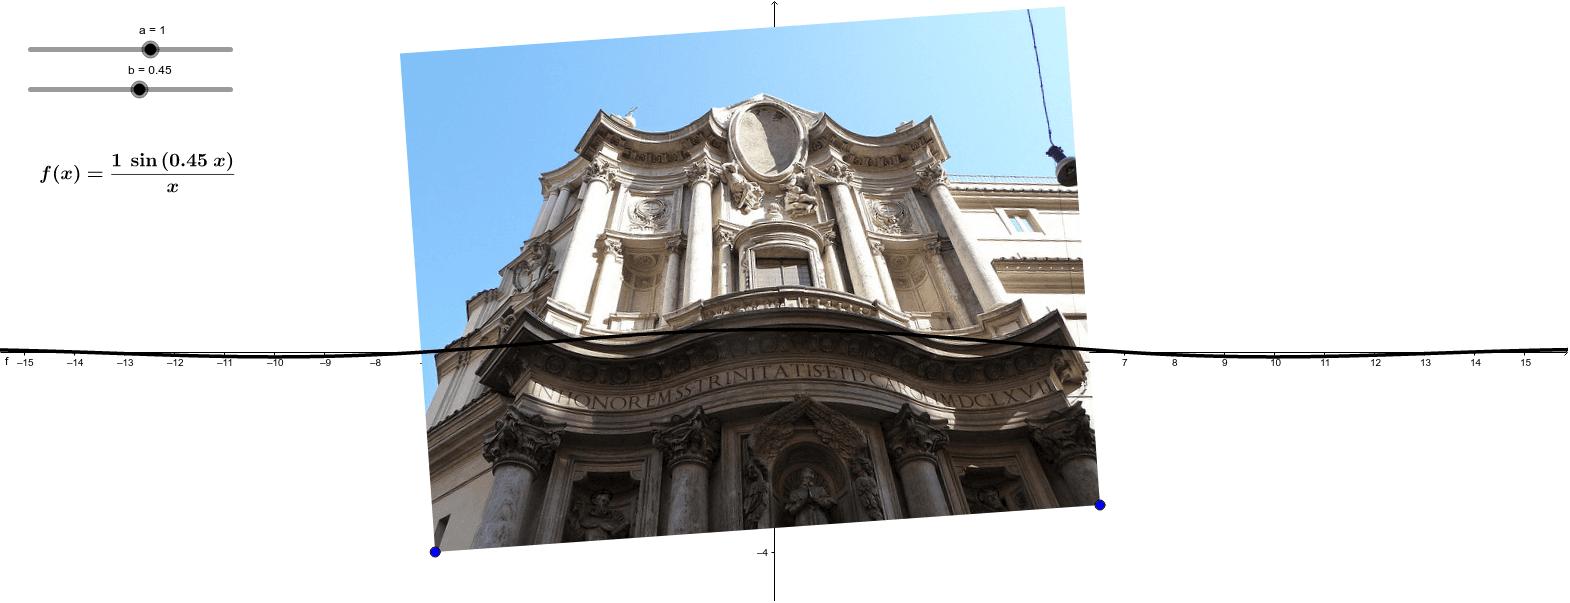 Iglesia San Carlo alle Quattro Fontane - Roma, Italia